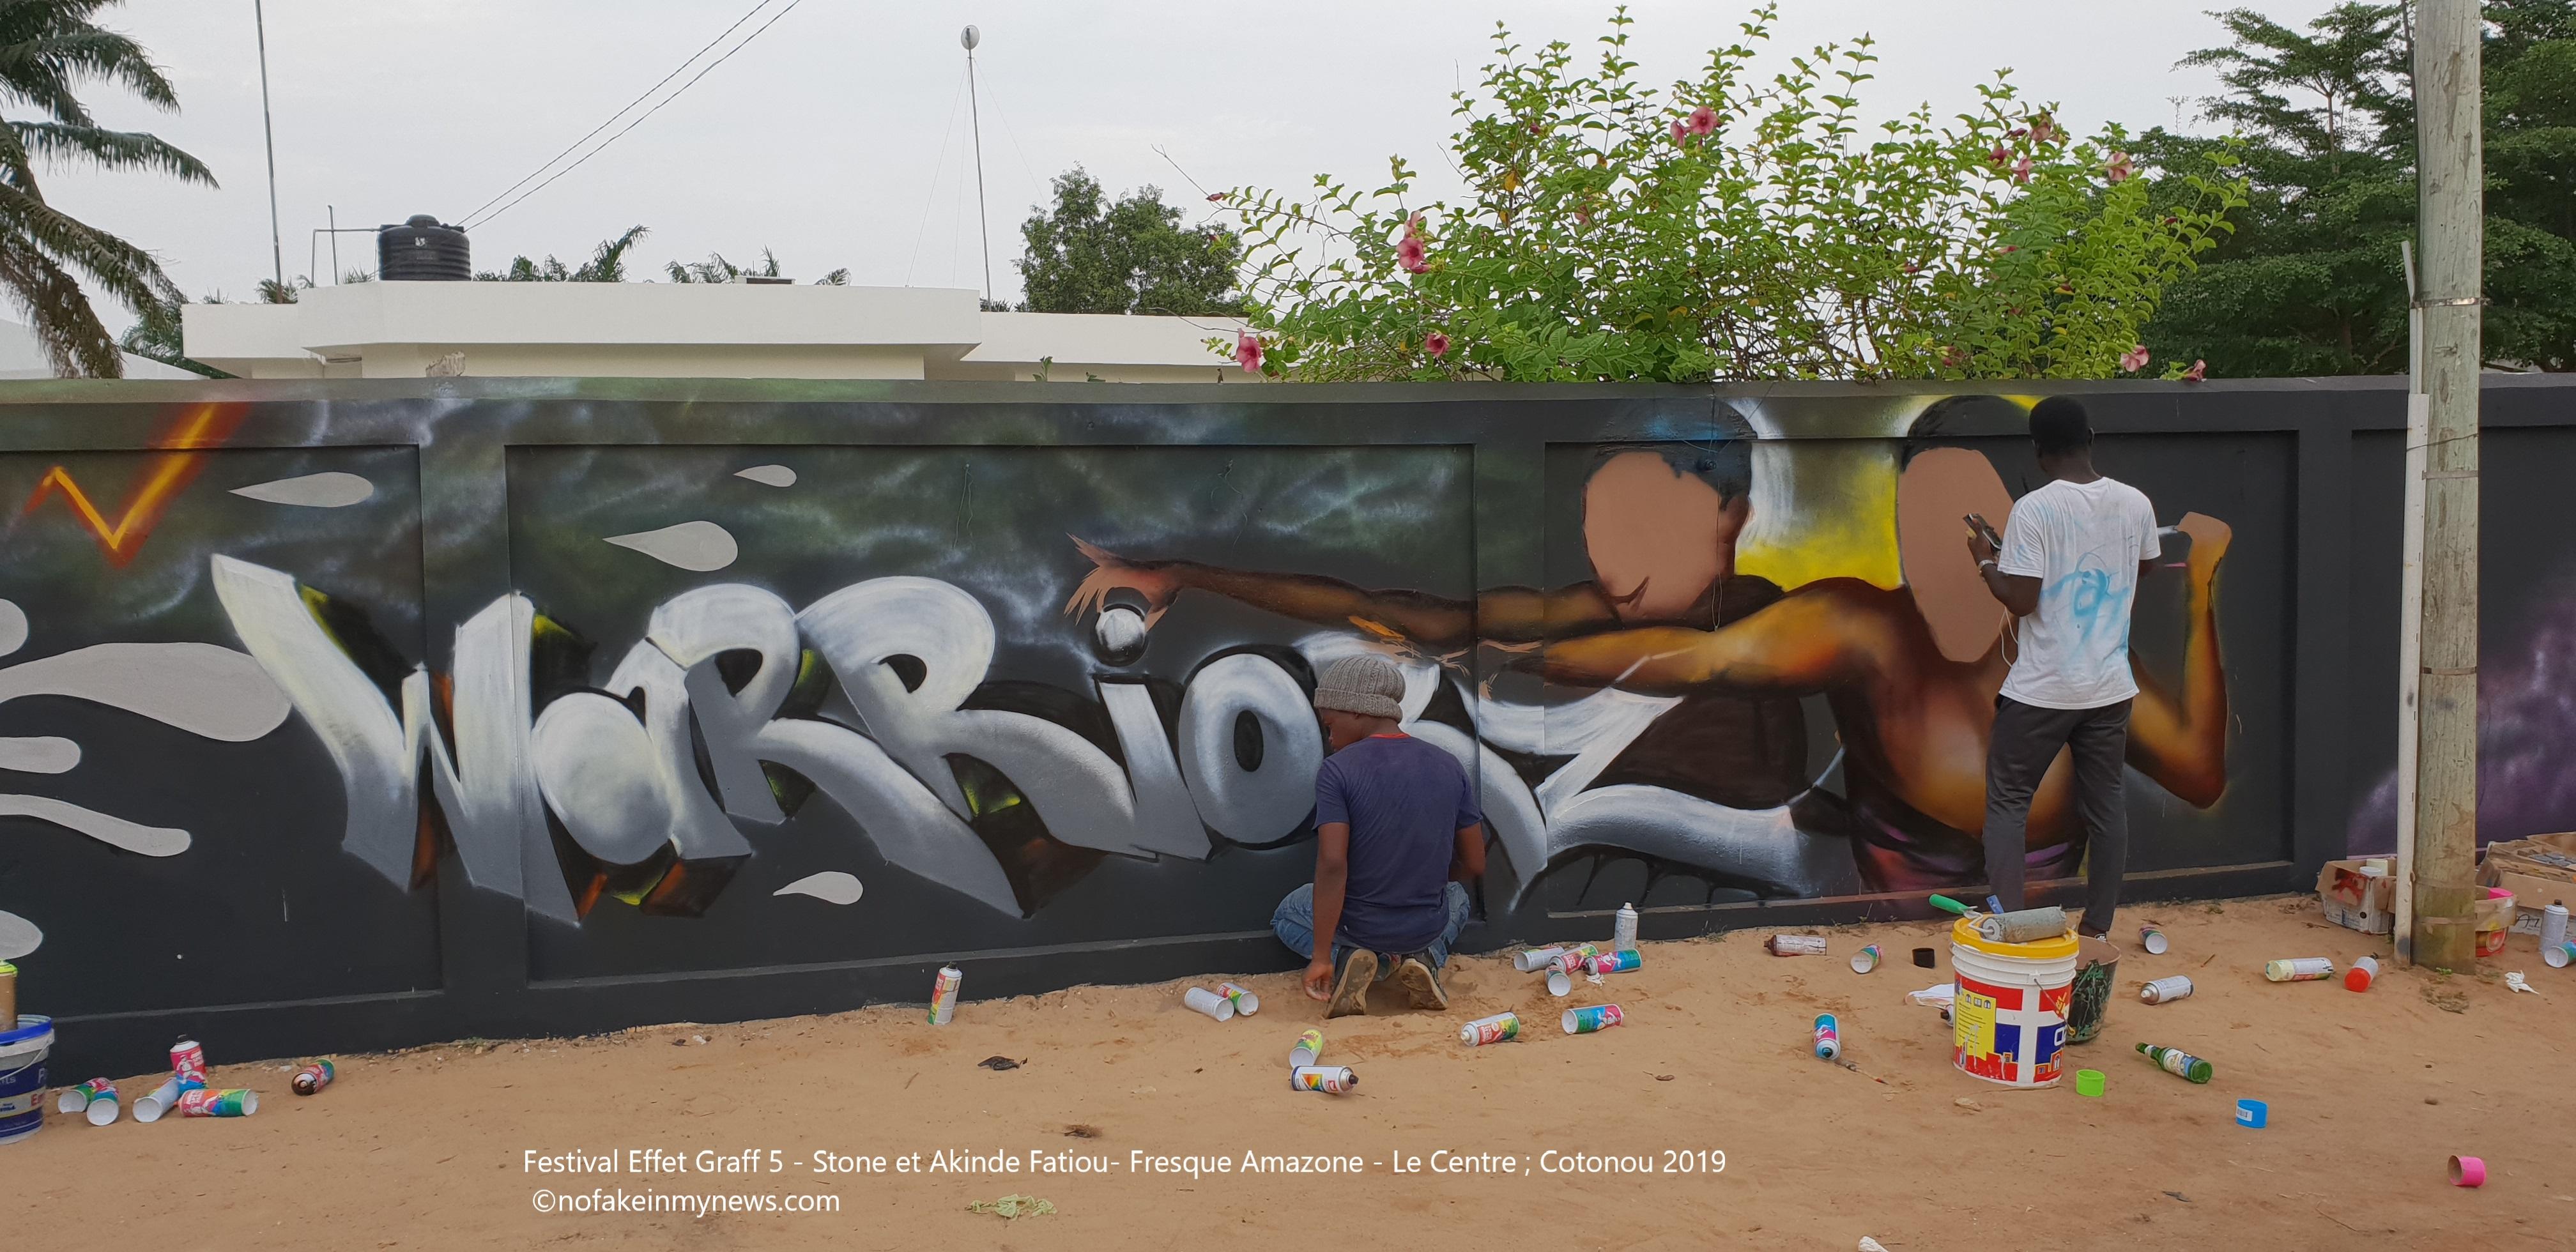 Festival Effet Graff 5 - Stone et Akinde Fatiou- Fresque Amazone - Le Centre ; Cotonou 2019 ©nofakeinmynews